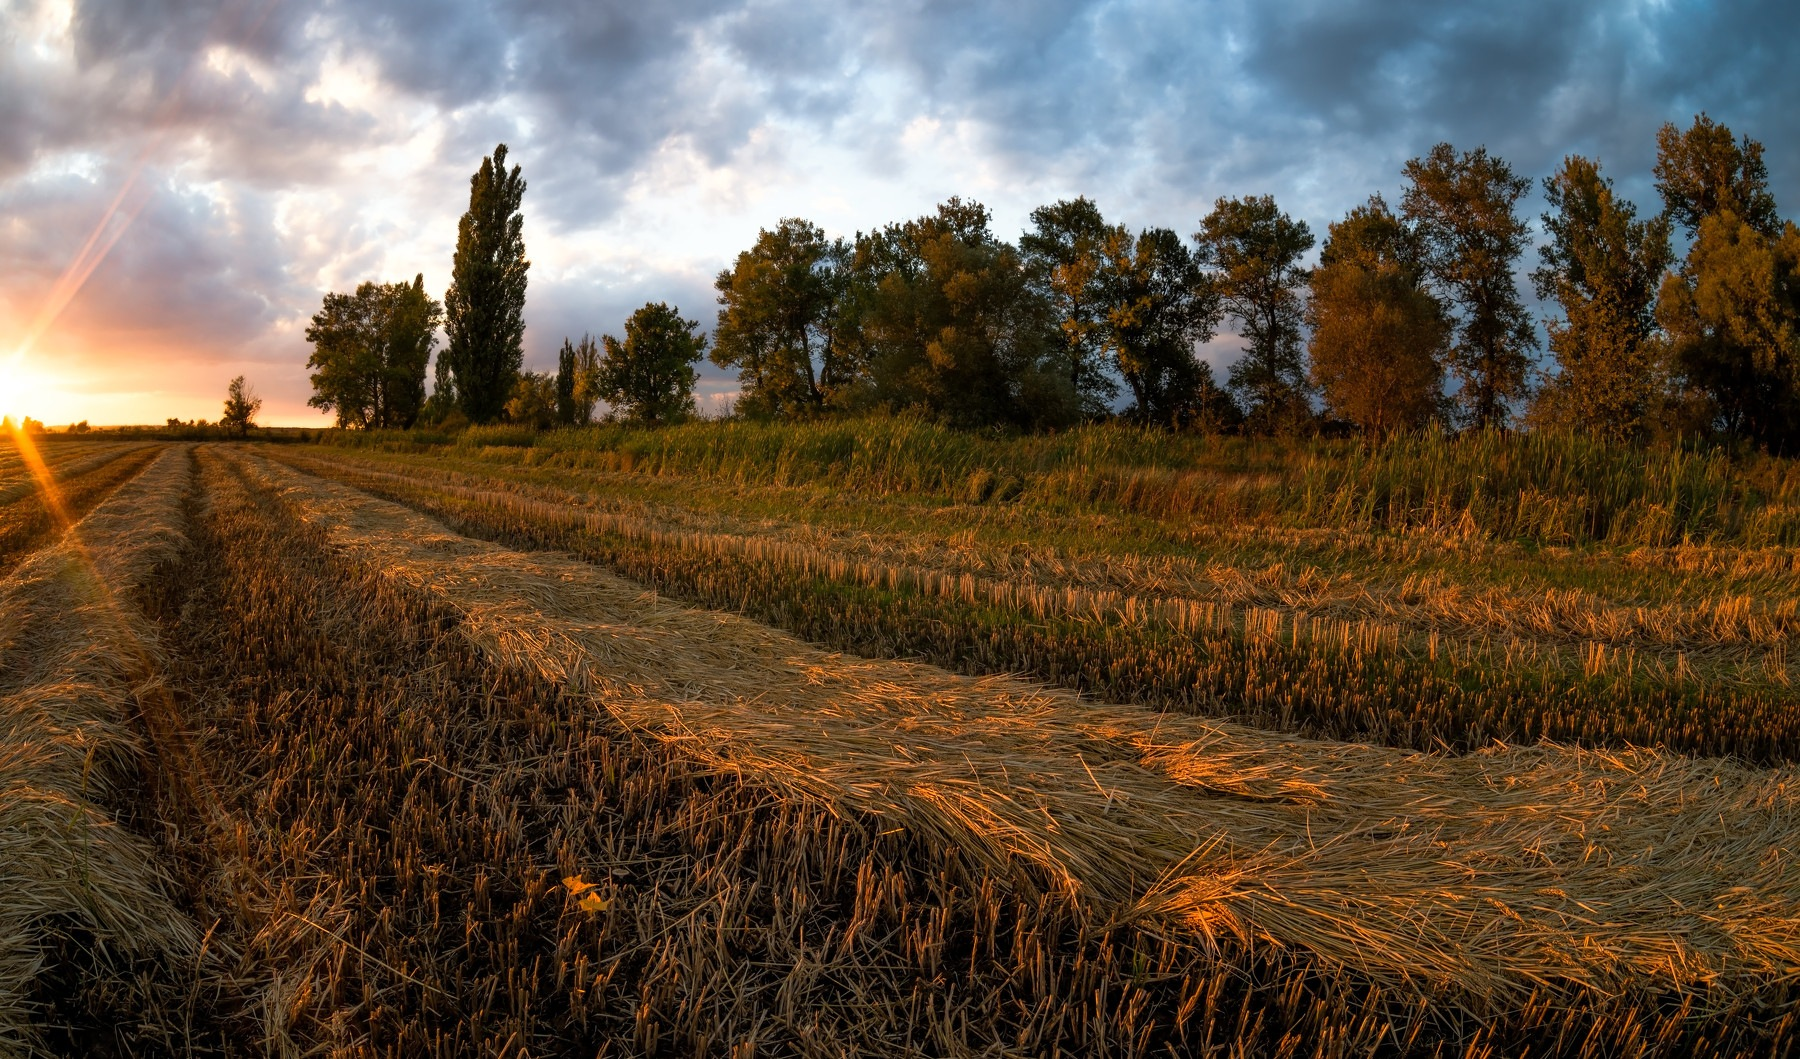 Autumn by Alexander Plekhanov